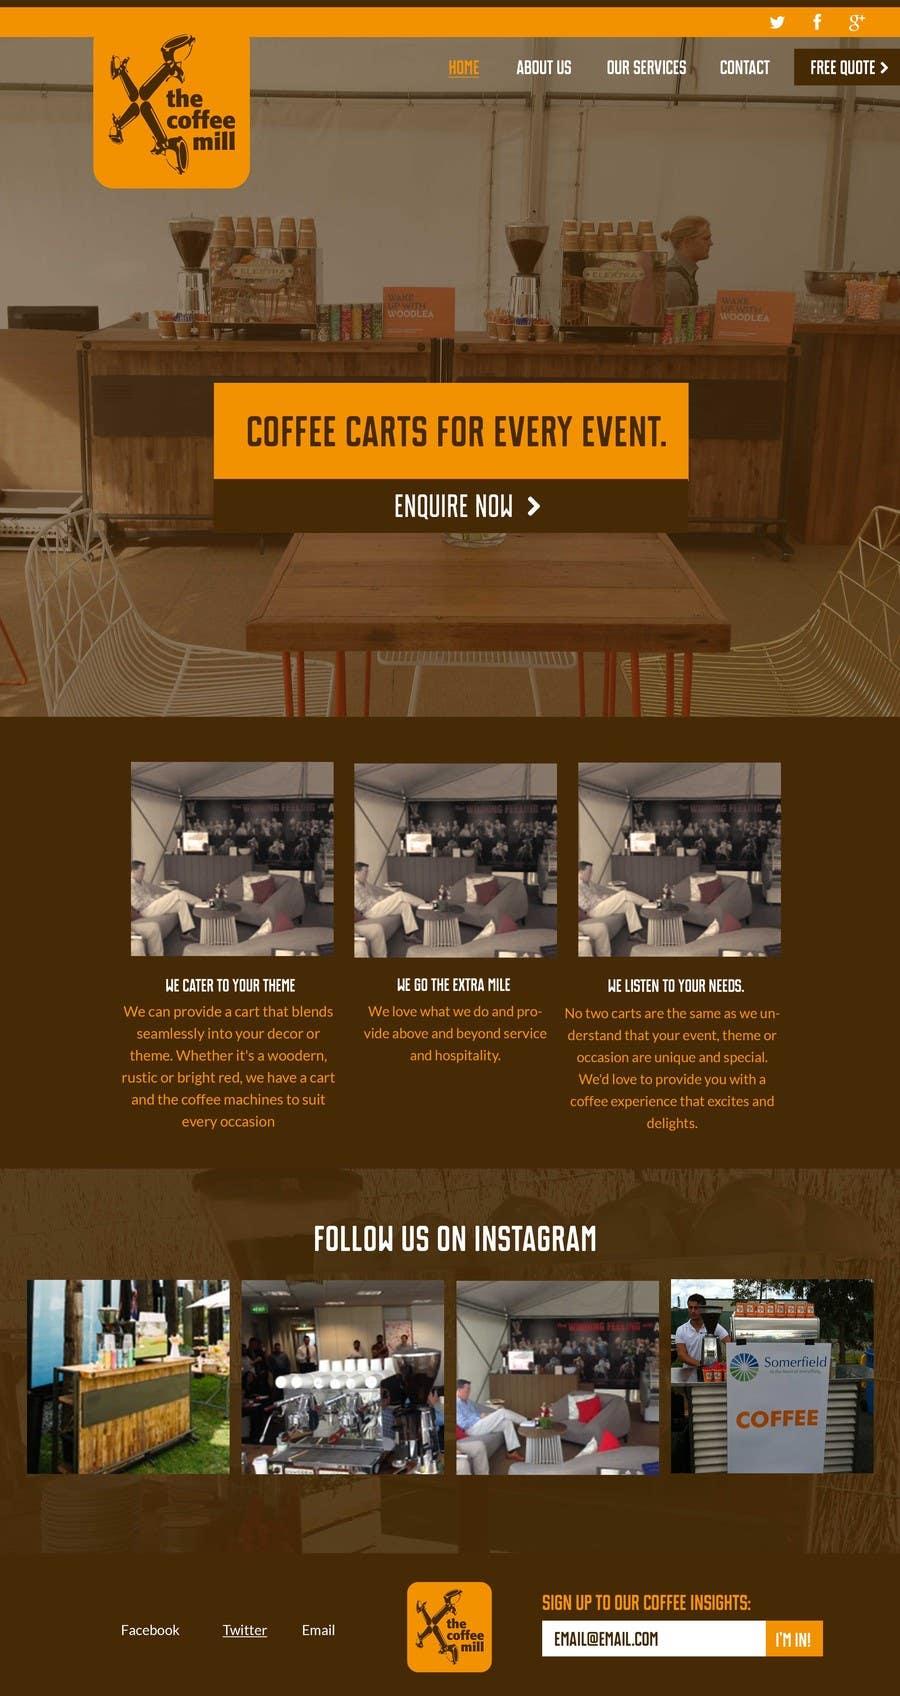 Konkurrenceindlæg #                                        11                                      for                                         Design a Website Mockup for a Mobile Coffee Business